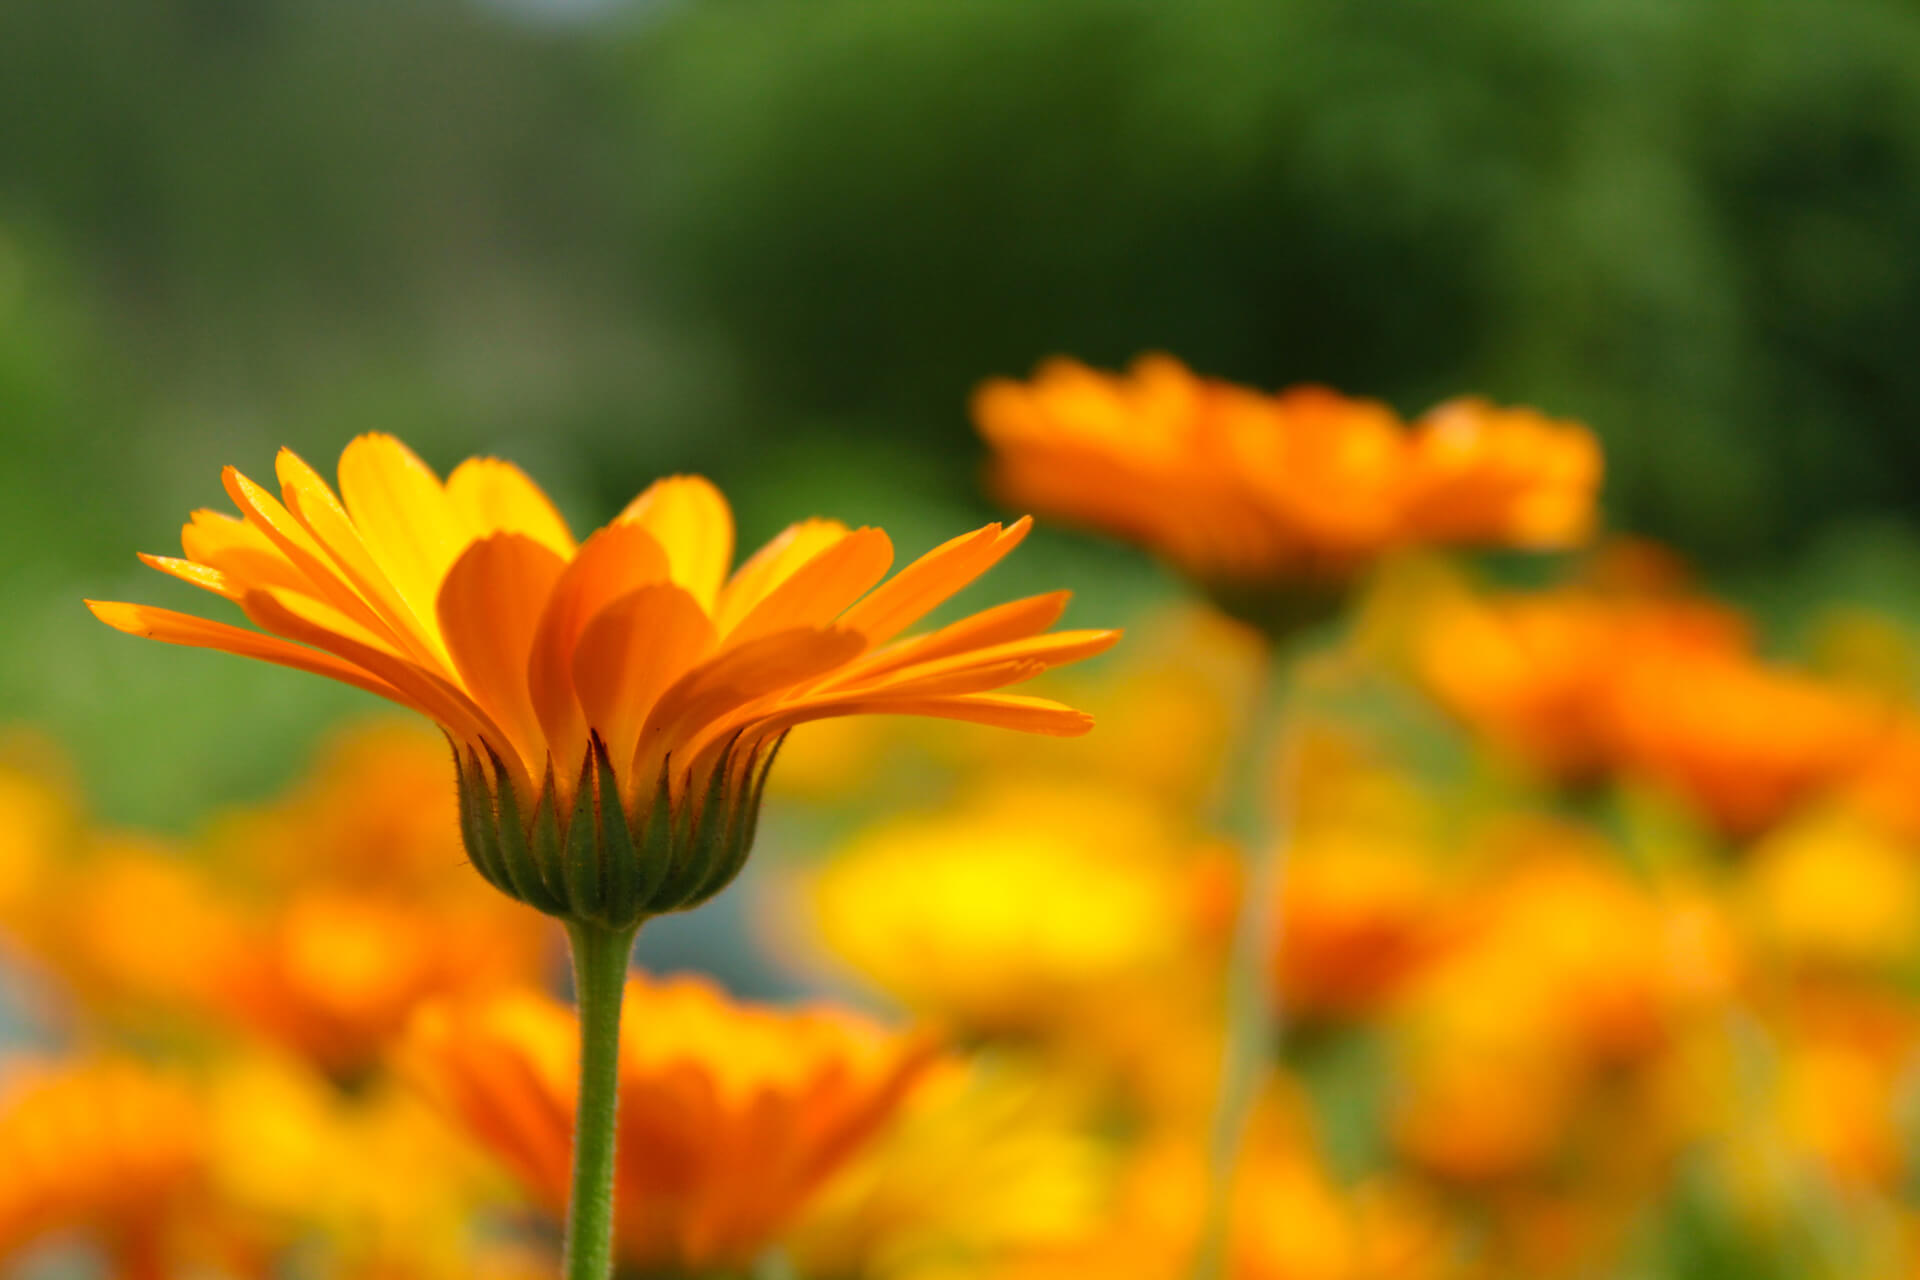 Orange calendulas growing in a field.